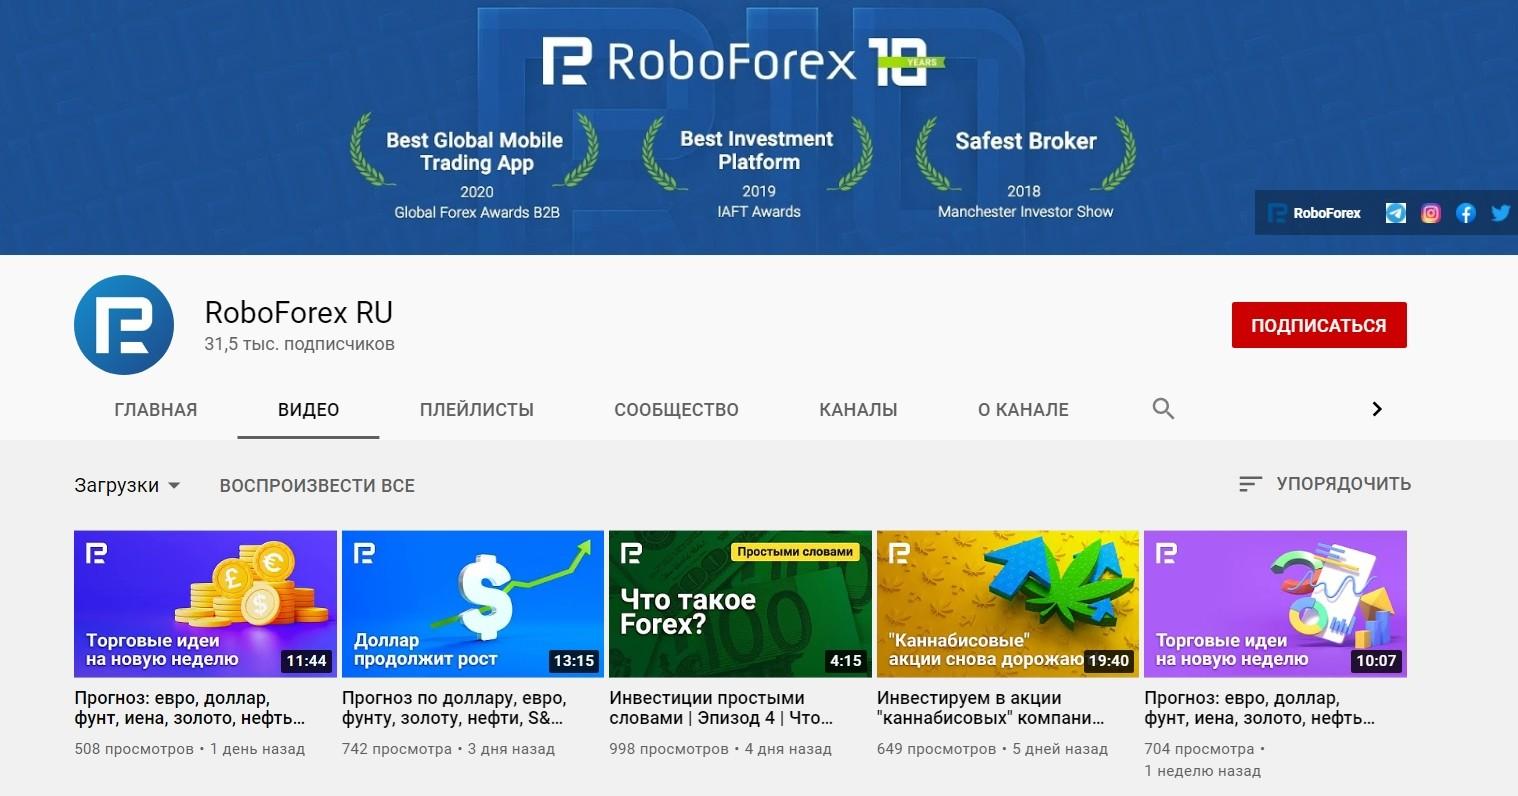 Ютуб канал Робофорекс